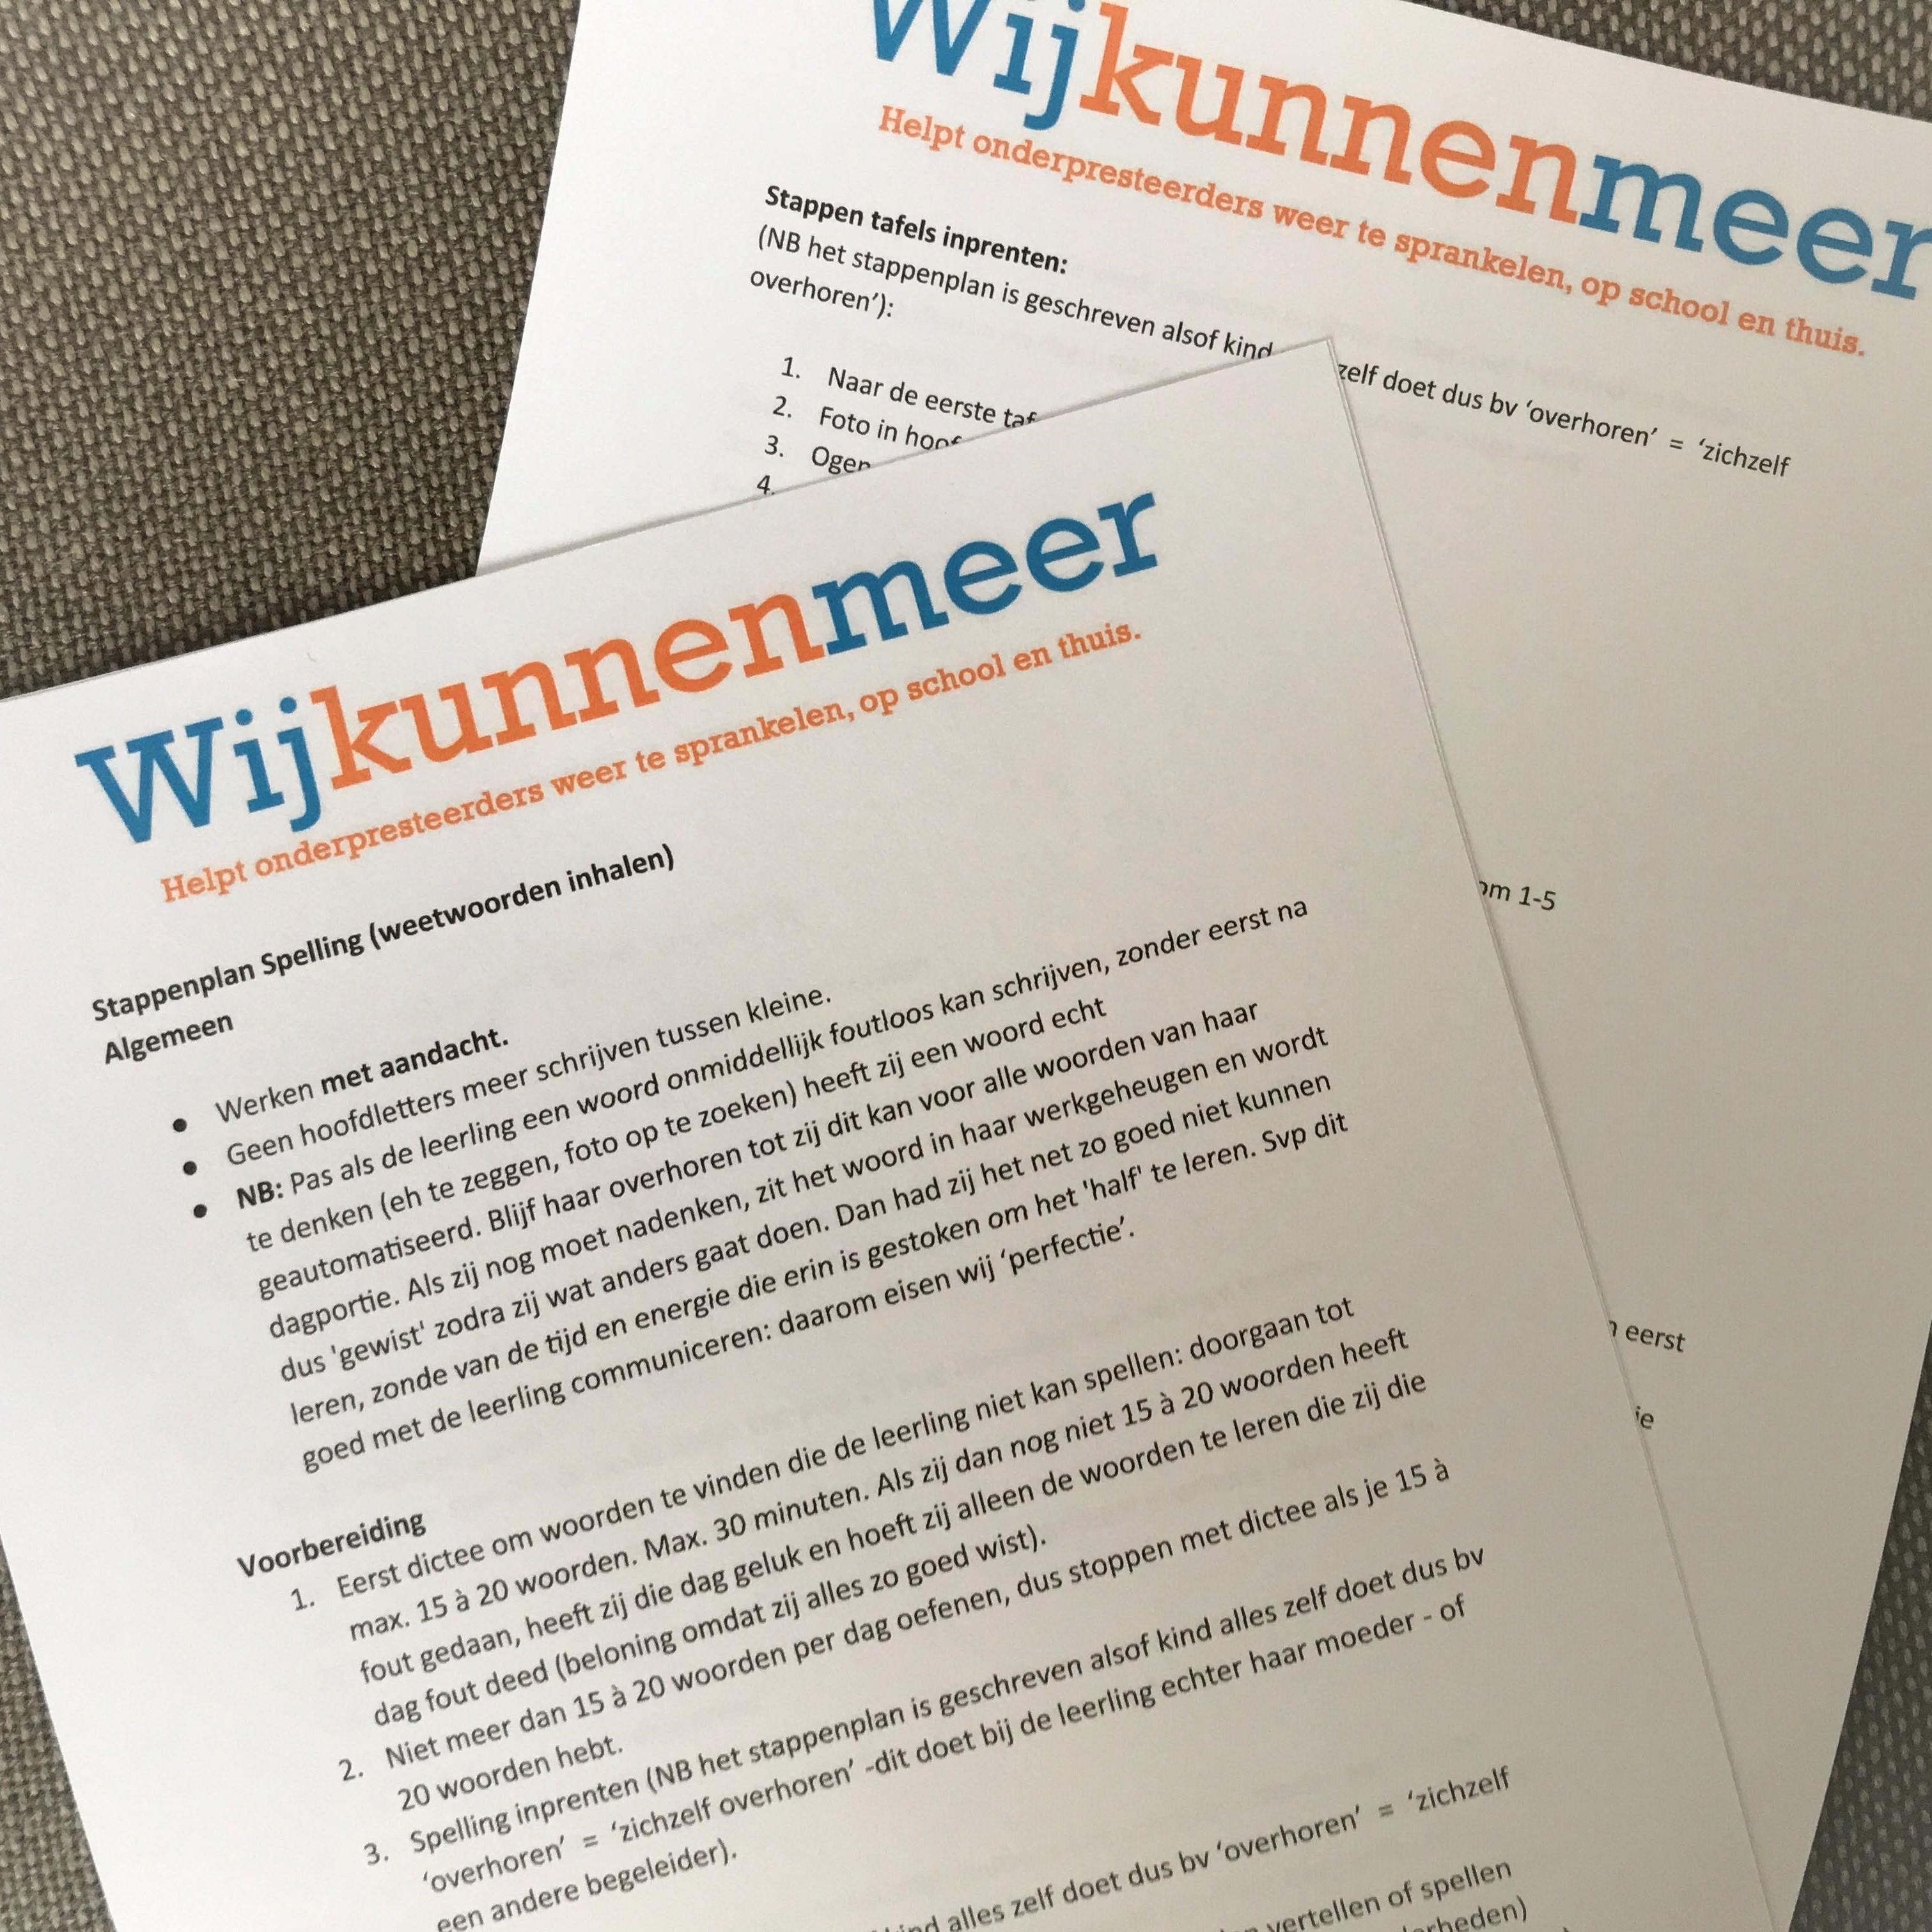 Stappenplan Spelling en tafels leren